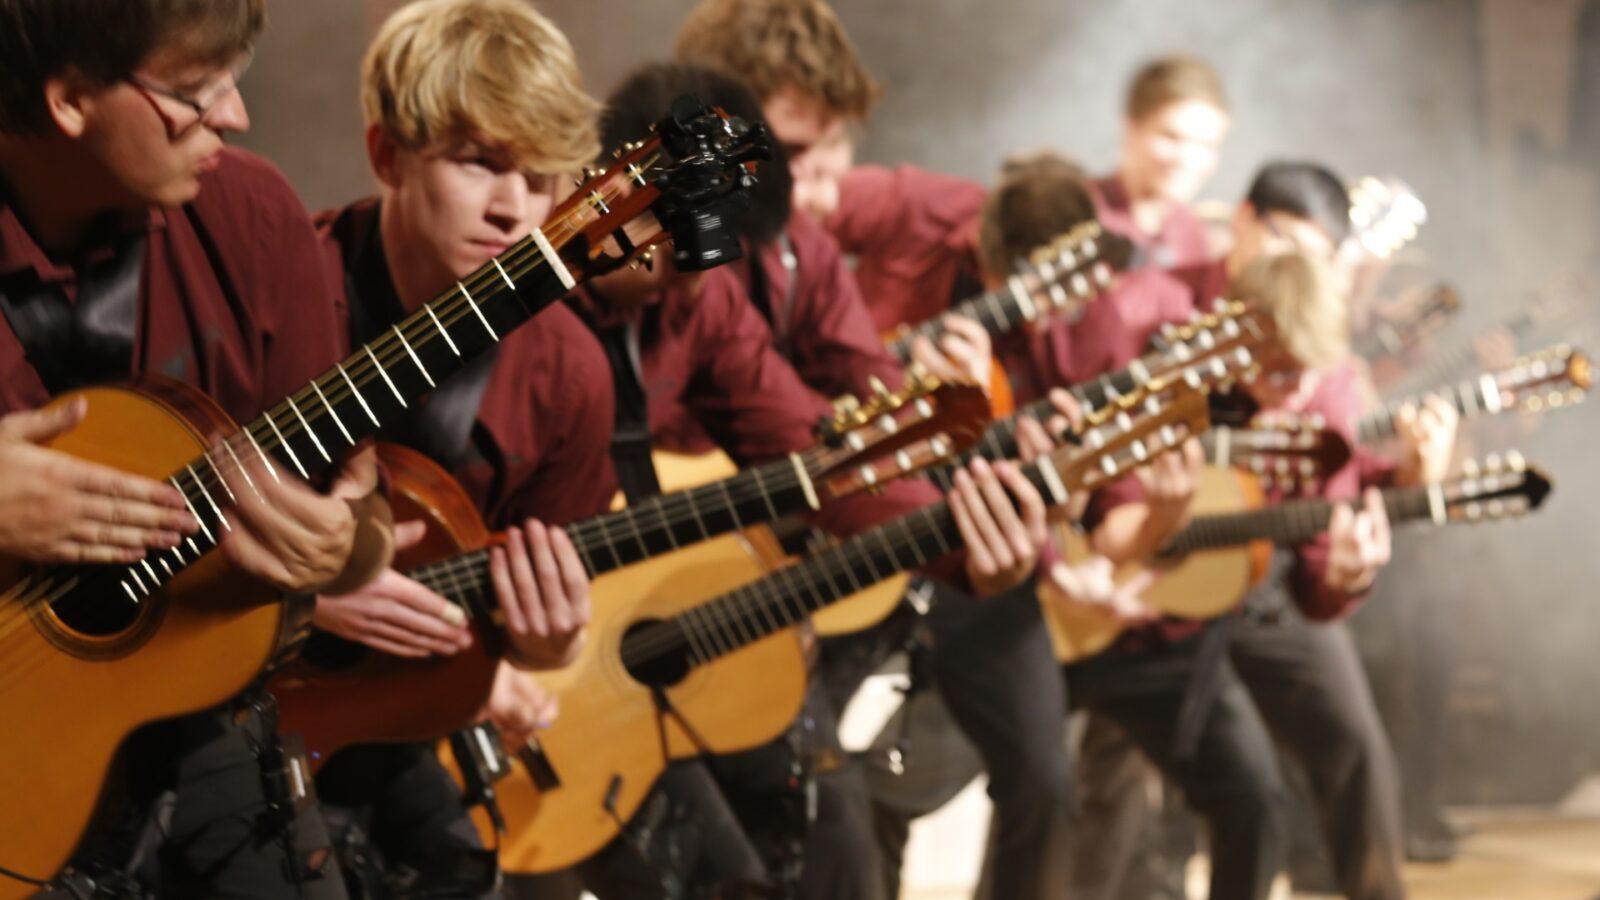 NEWS: Eiffe, Gitarre lernen, Kinderrechts-Woche & Co.